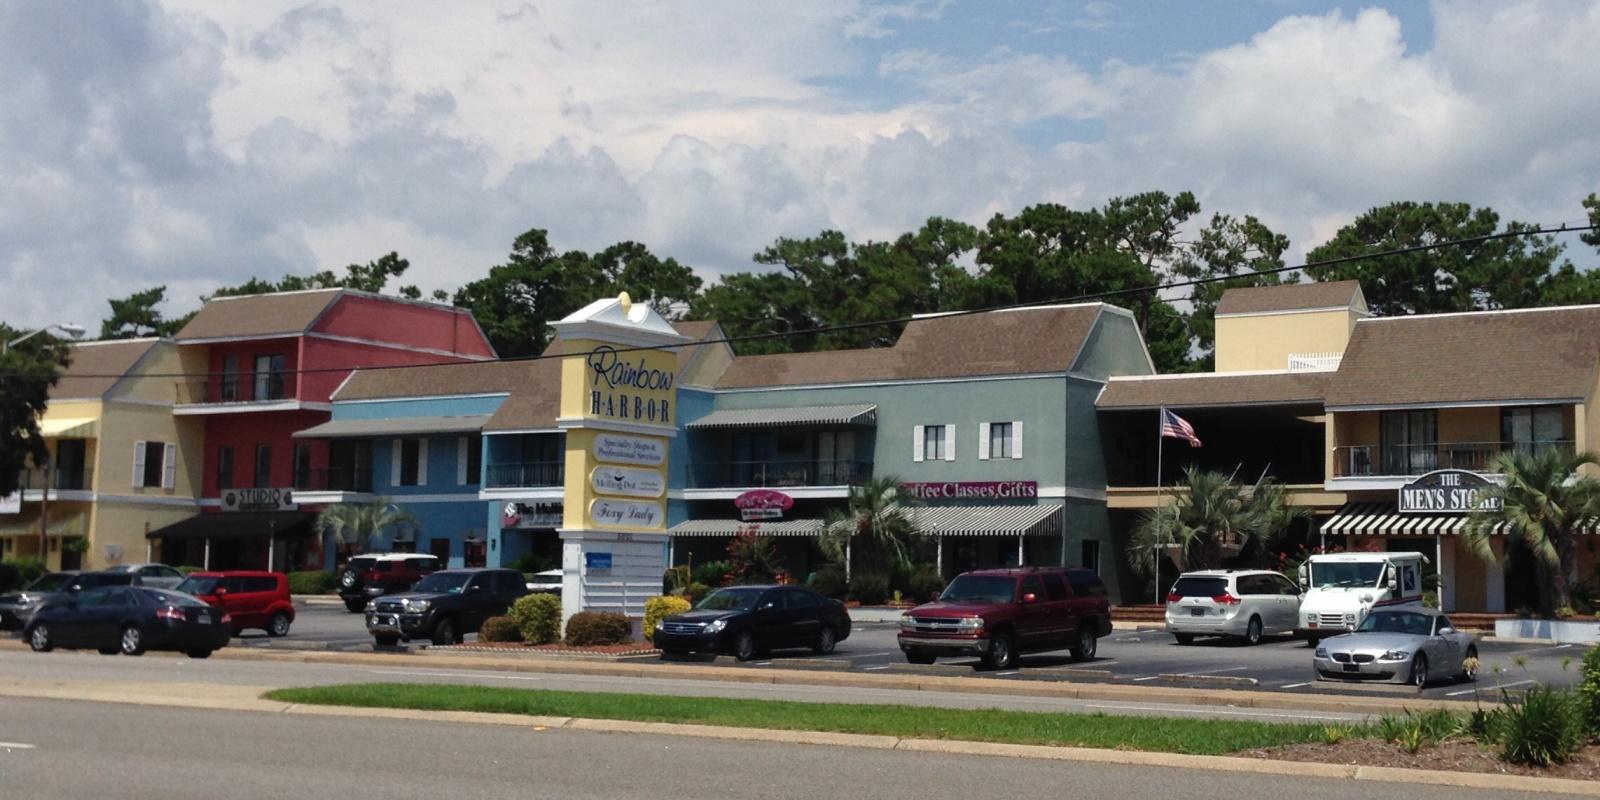 5001 North Kings Highway,Myrtle Beach,South Carolina,29577,Office / Medical,Rainbow Harbor,North Kings Highway,1456